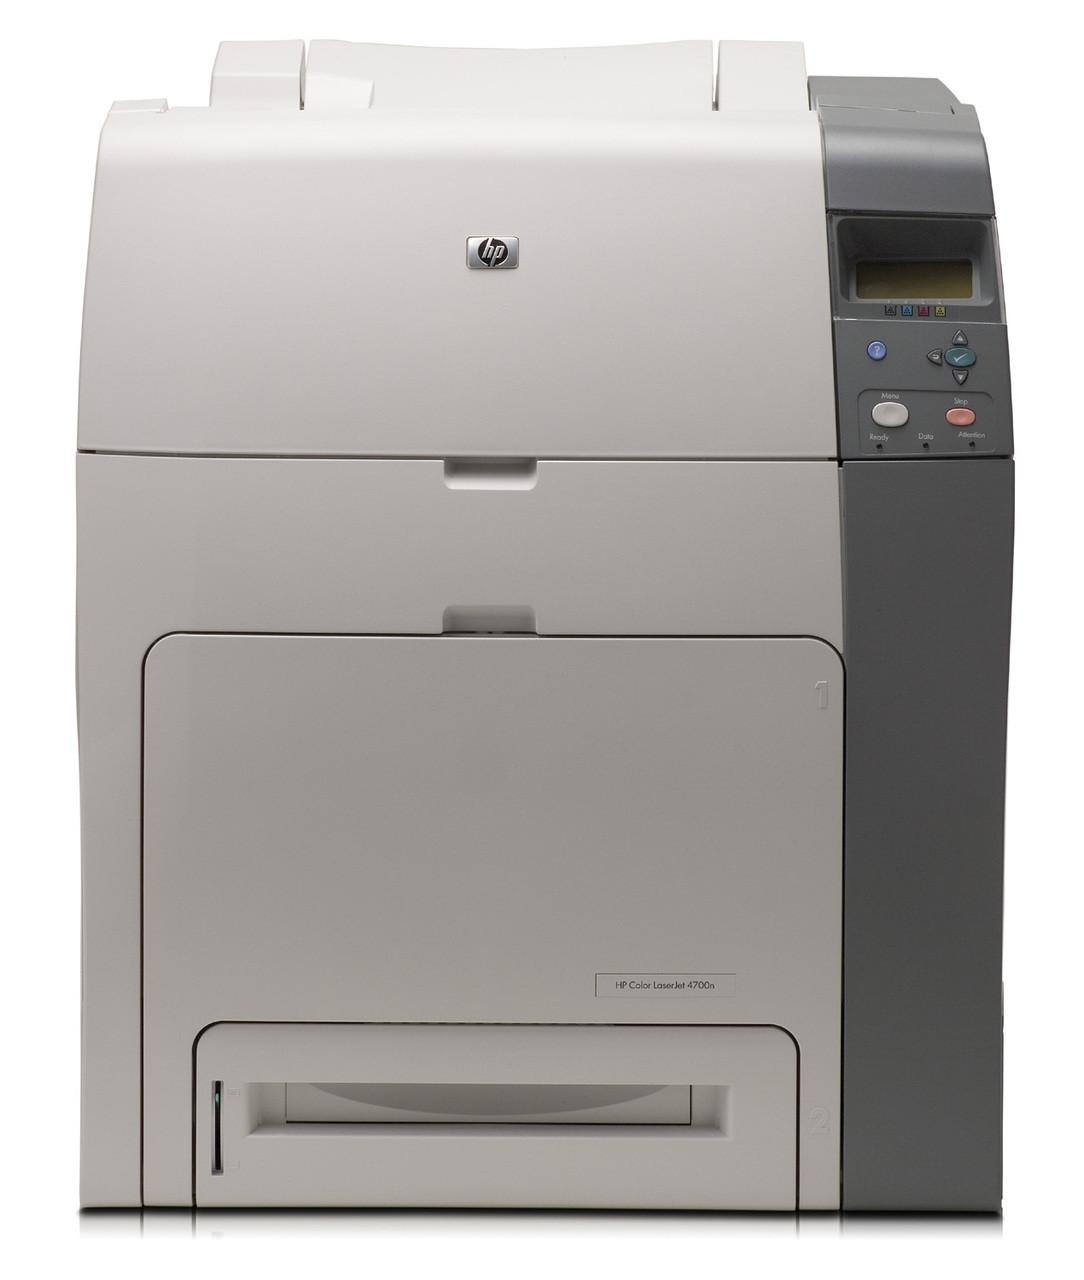 Hp hp color laser printers 11x17 - Hp Color Laserjet 4700tn Q7494a Hp Laser Printer For Sale